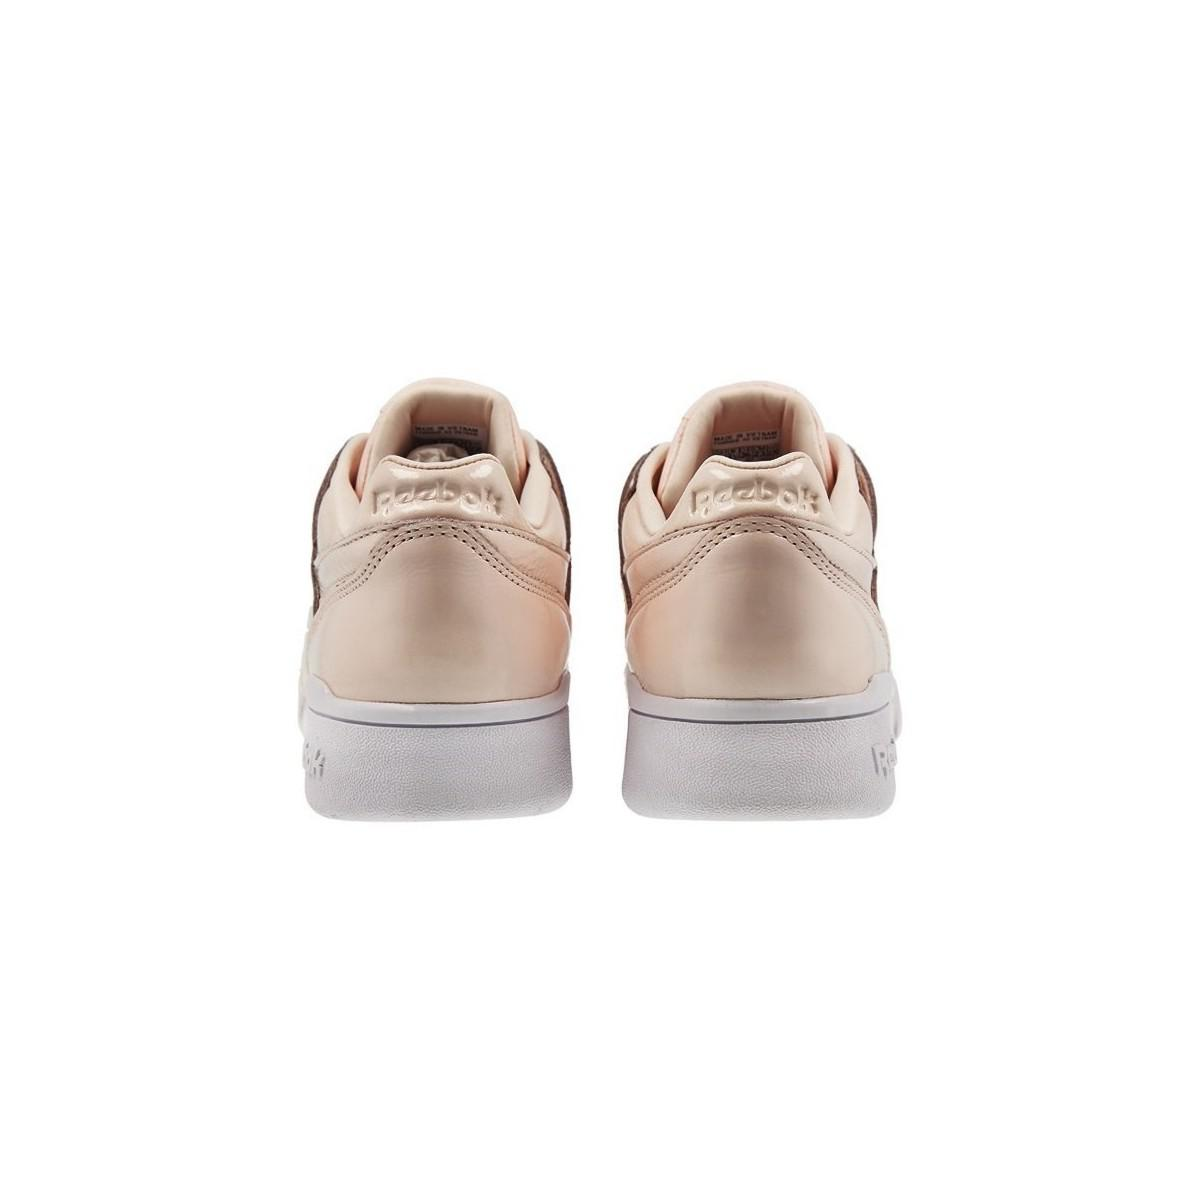 Reebok W Lo Plus Iridescent Women's Shoes (trainers) In Multicolour